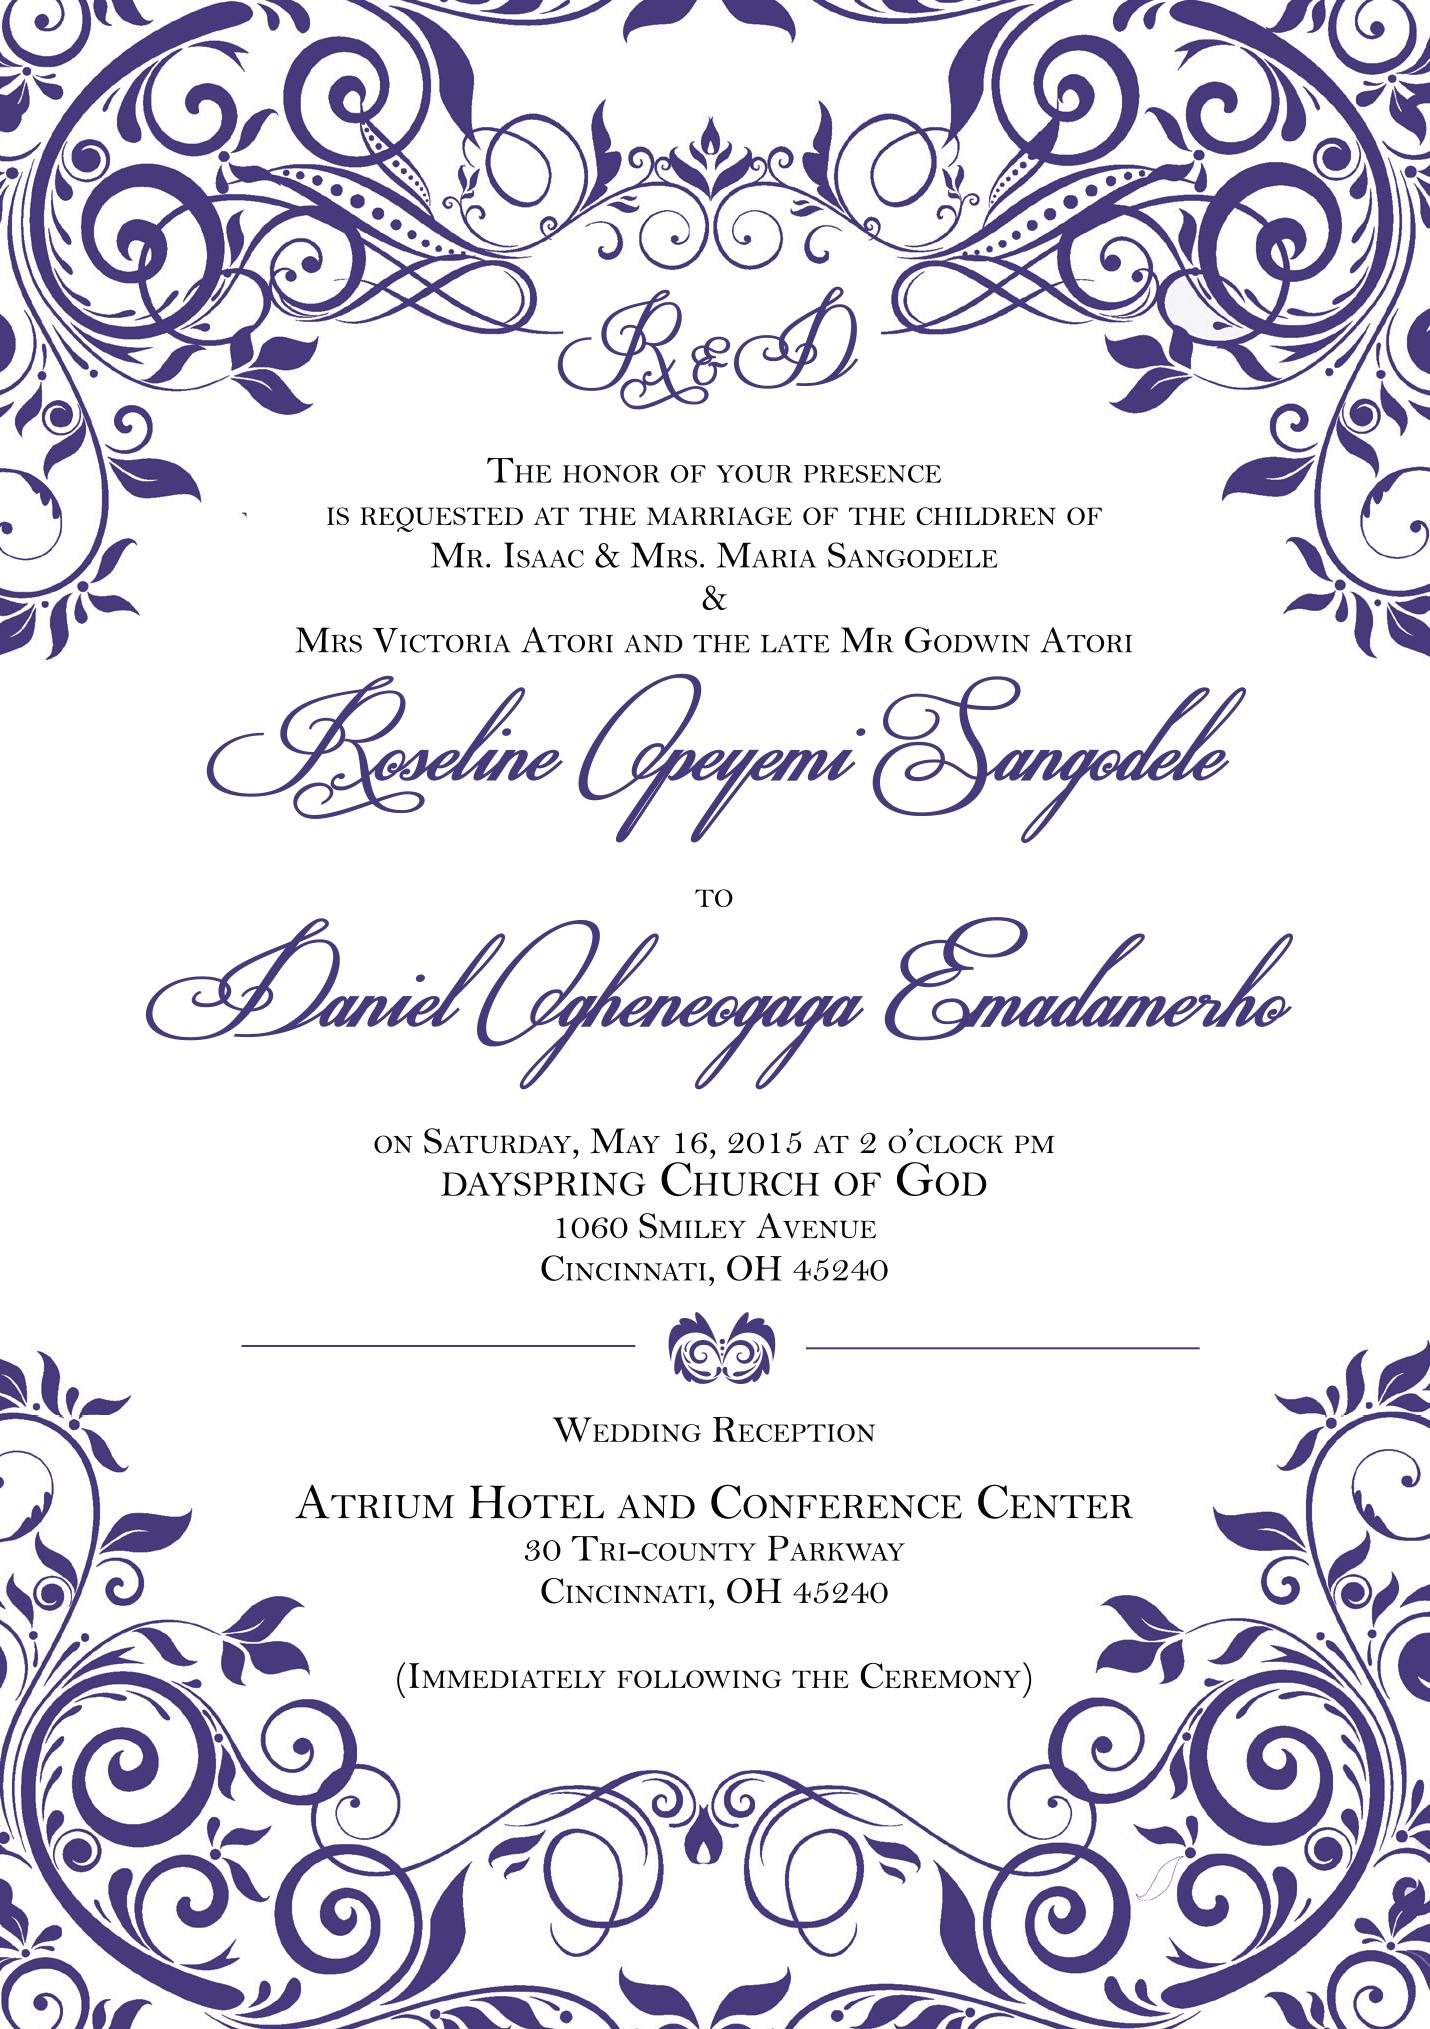 Wedding Invitation1.jpg